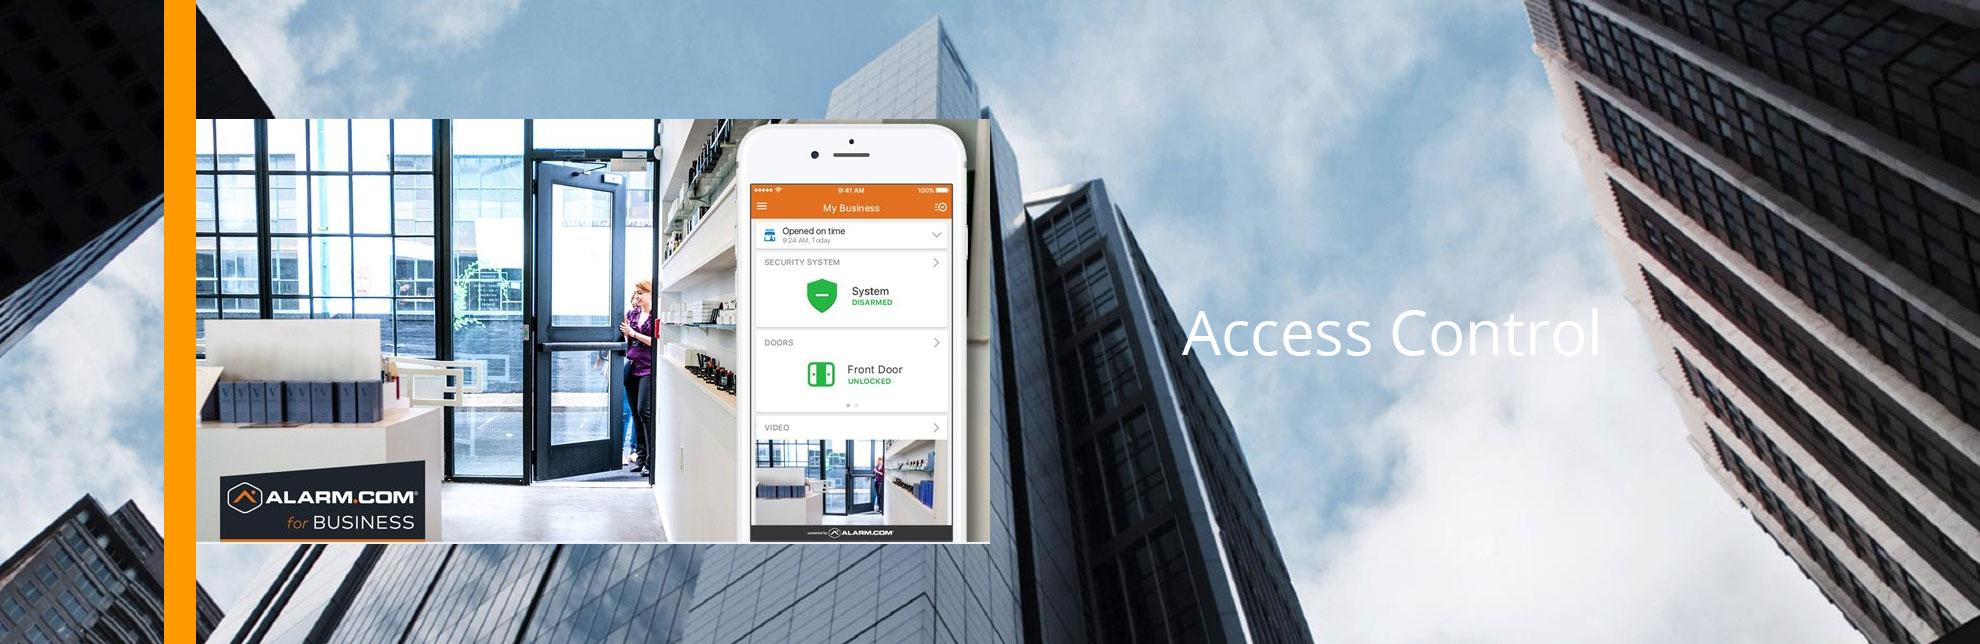 access-control-slider